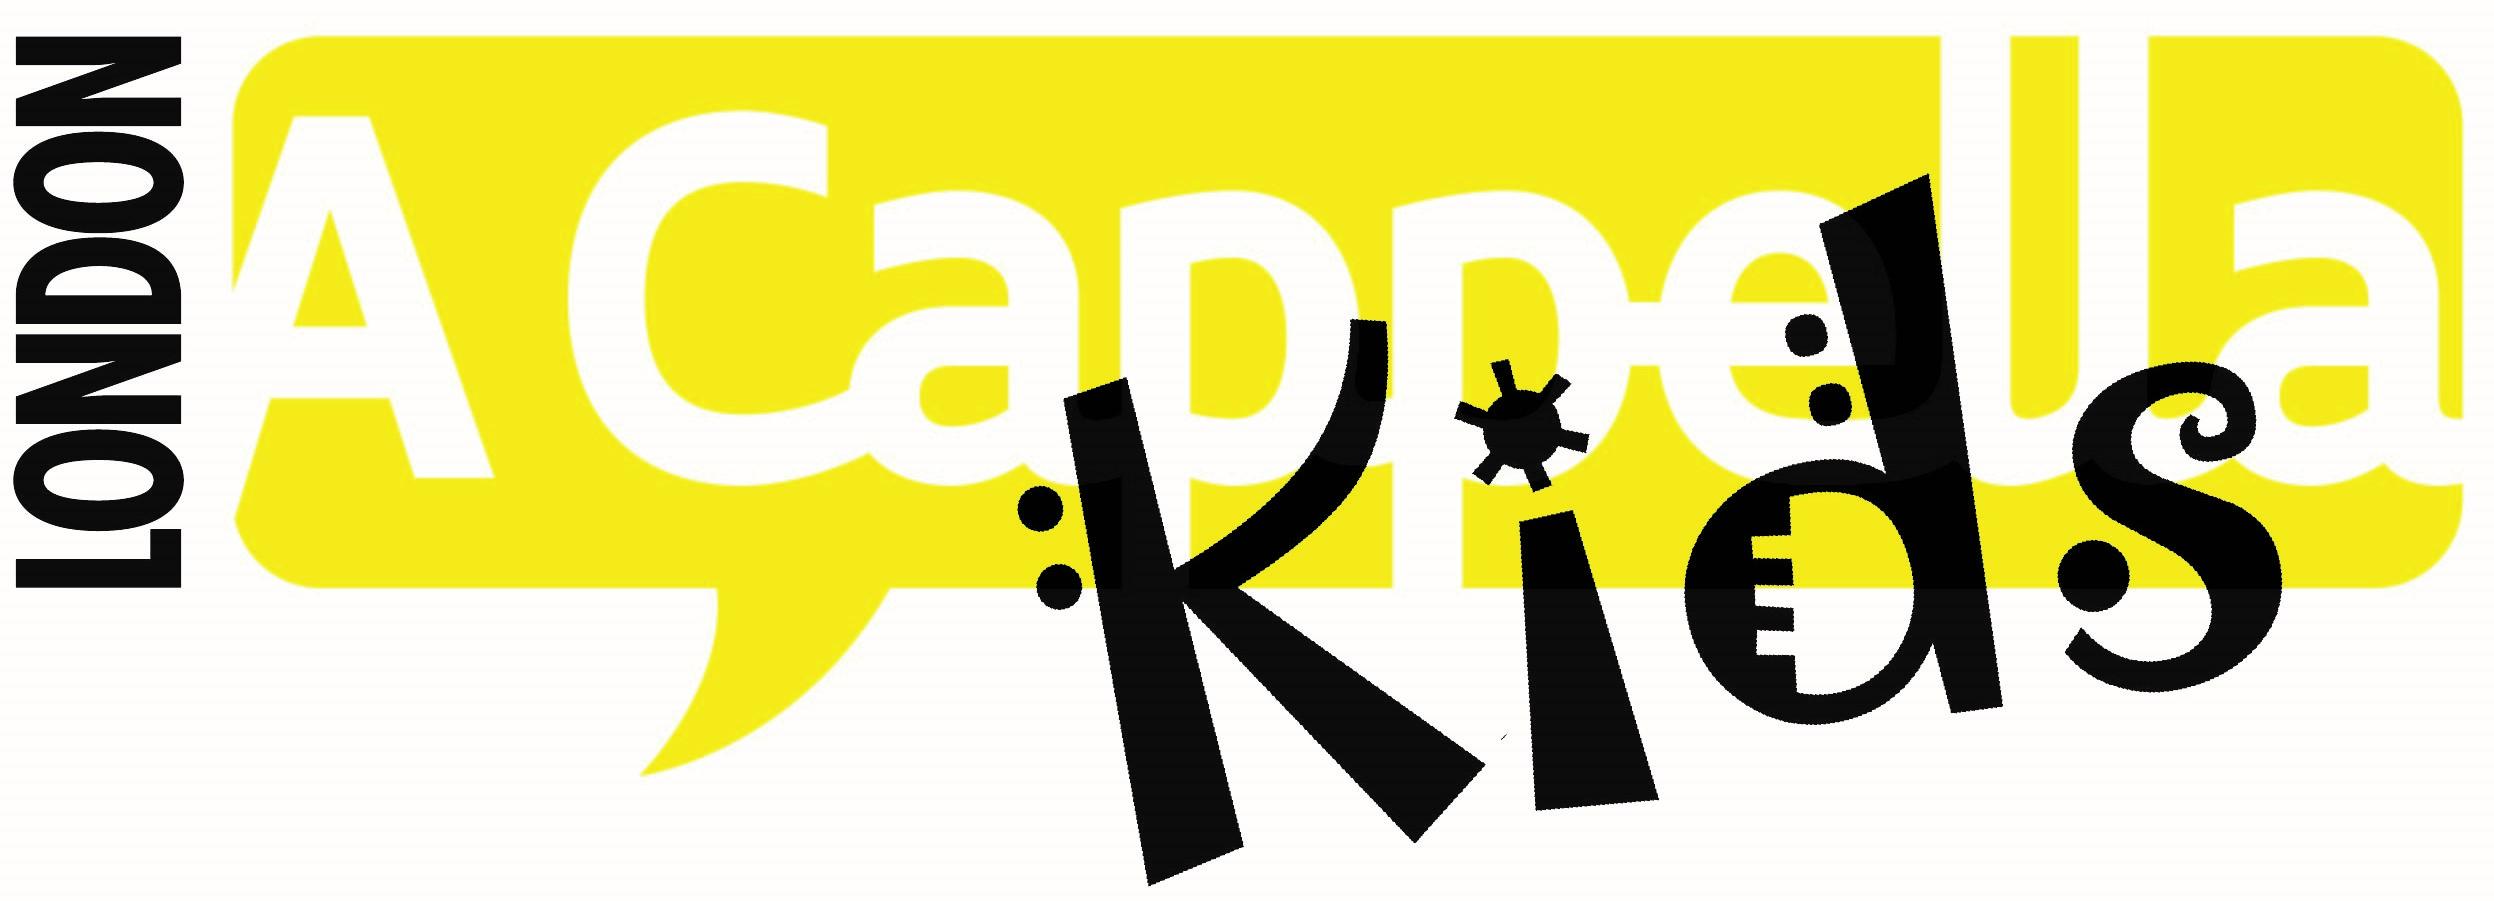 London A Capella kids logo2 - Copy.jpg